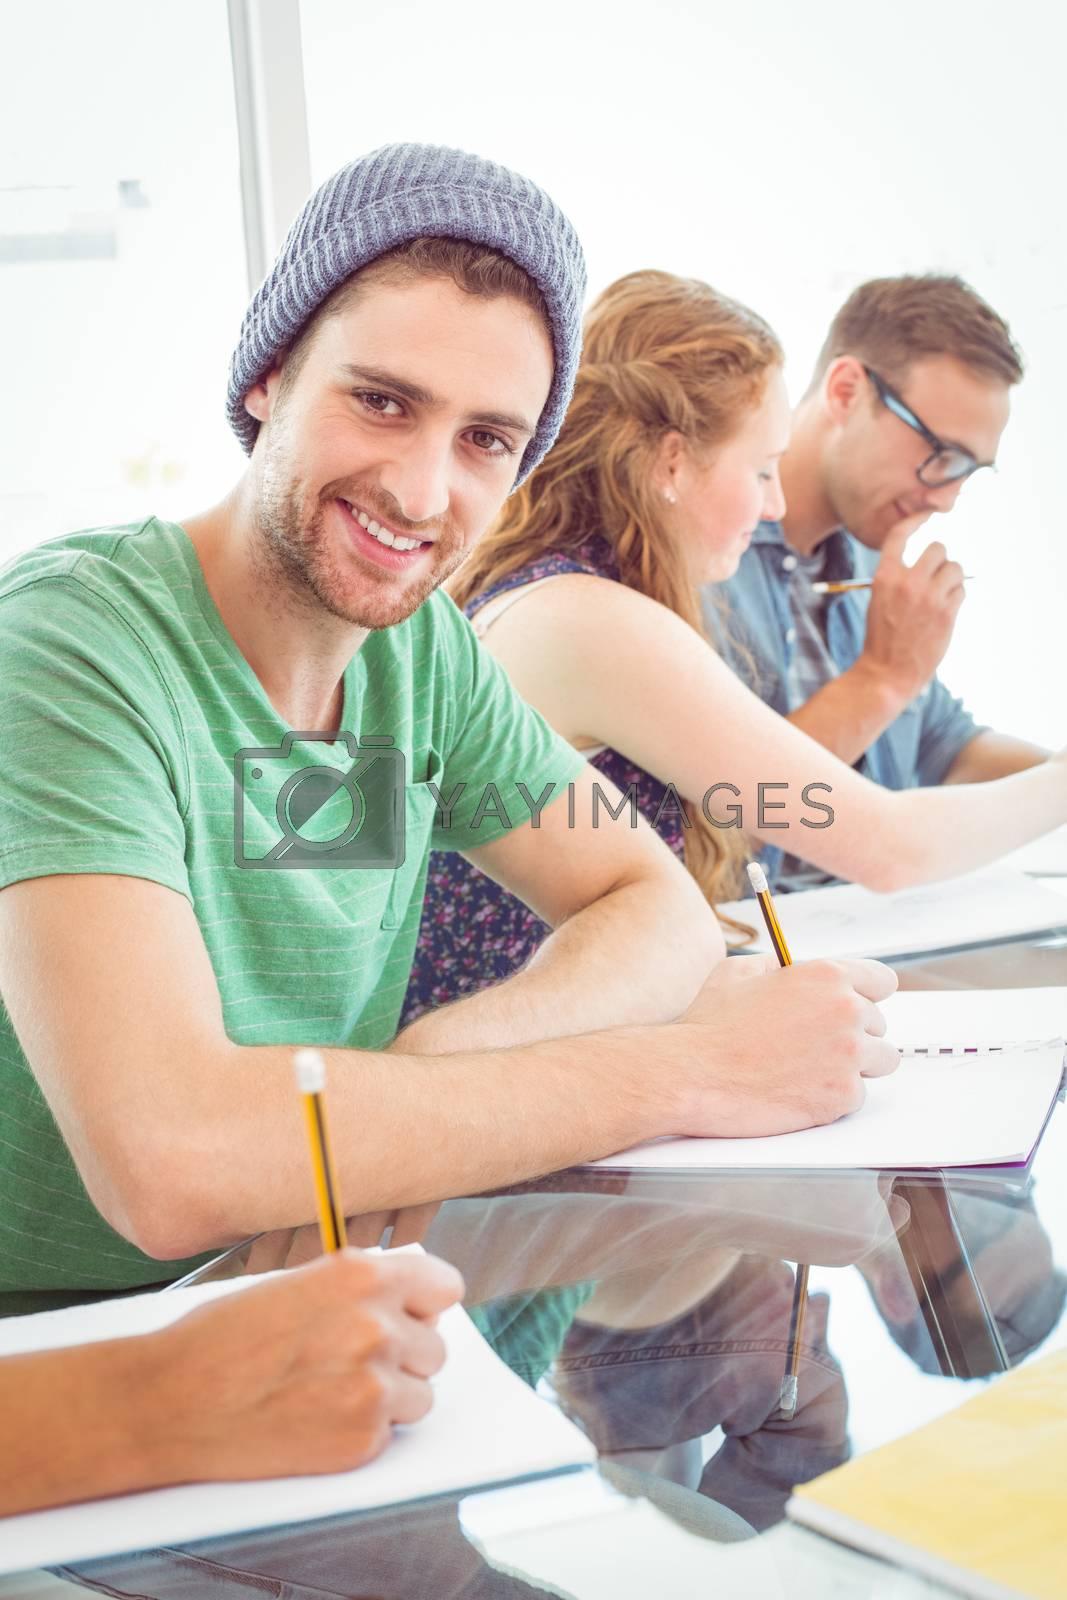 Fashion students writing on notepad  by Wavebreakmedia